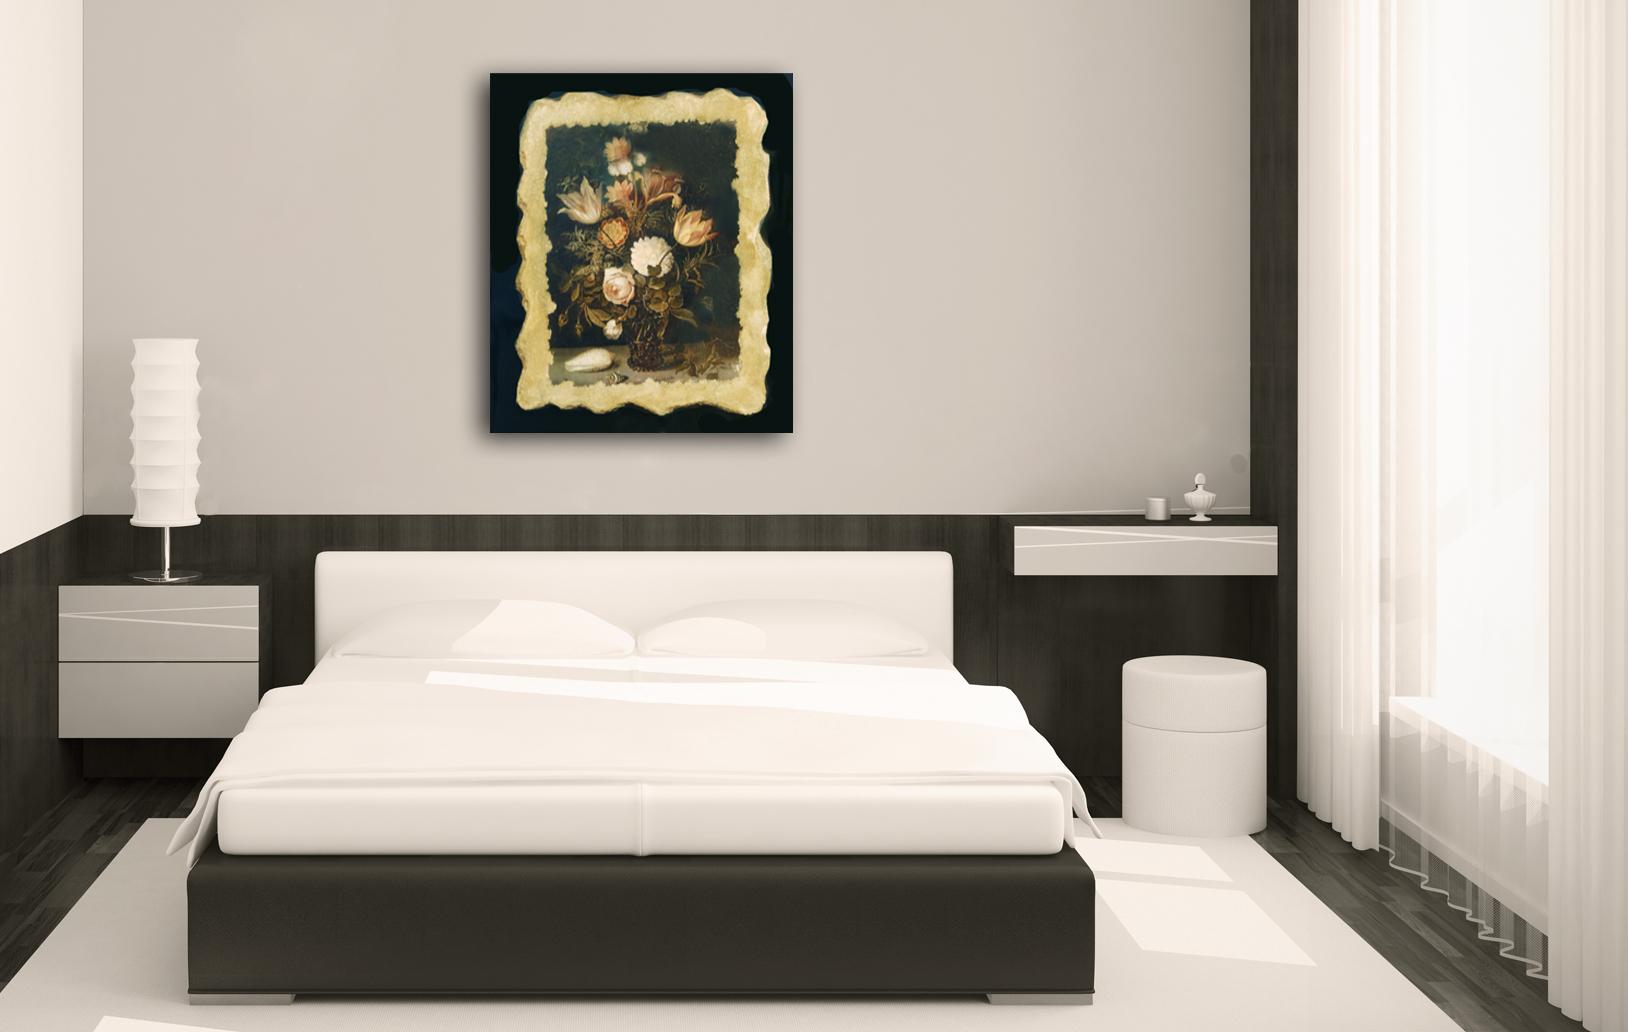 Фреска на холсте в спальне